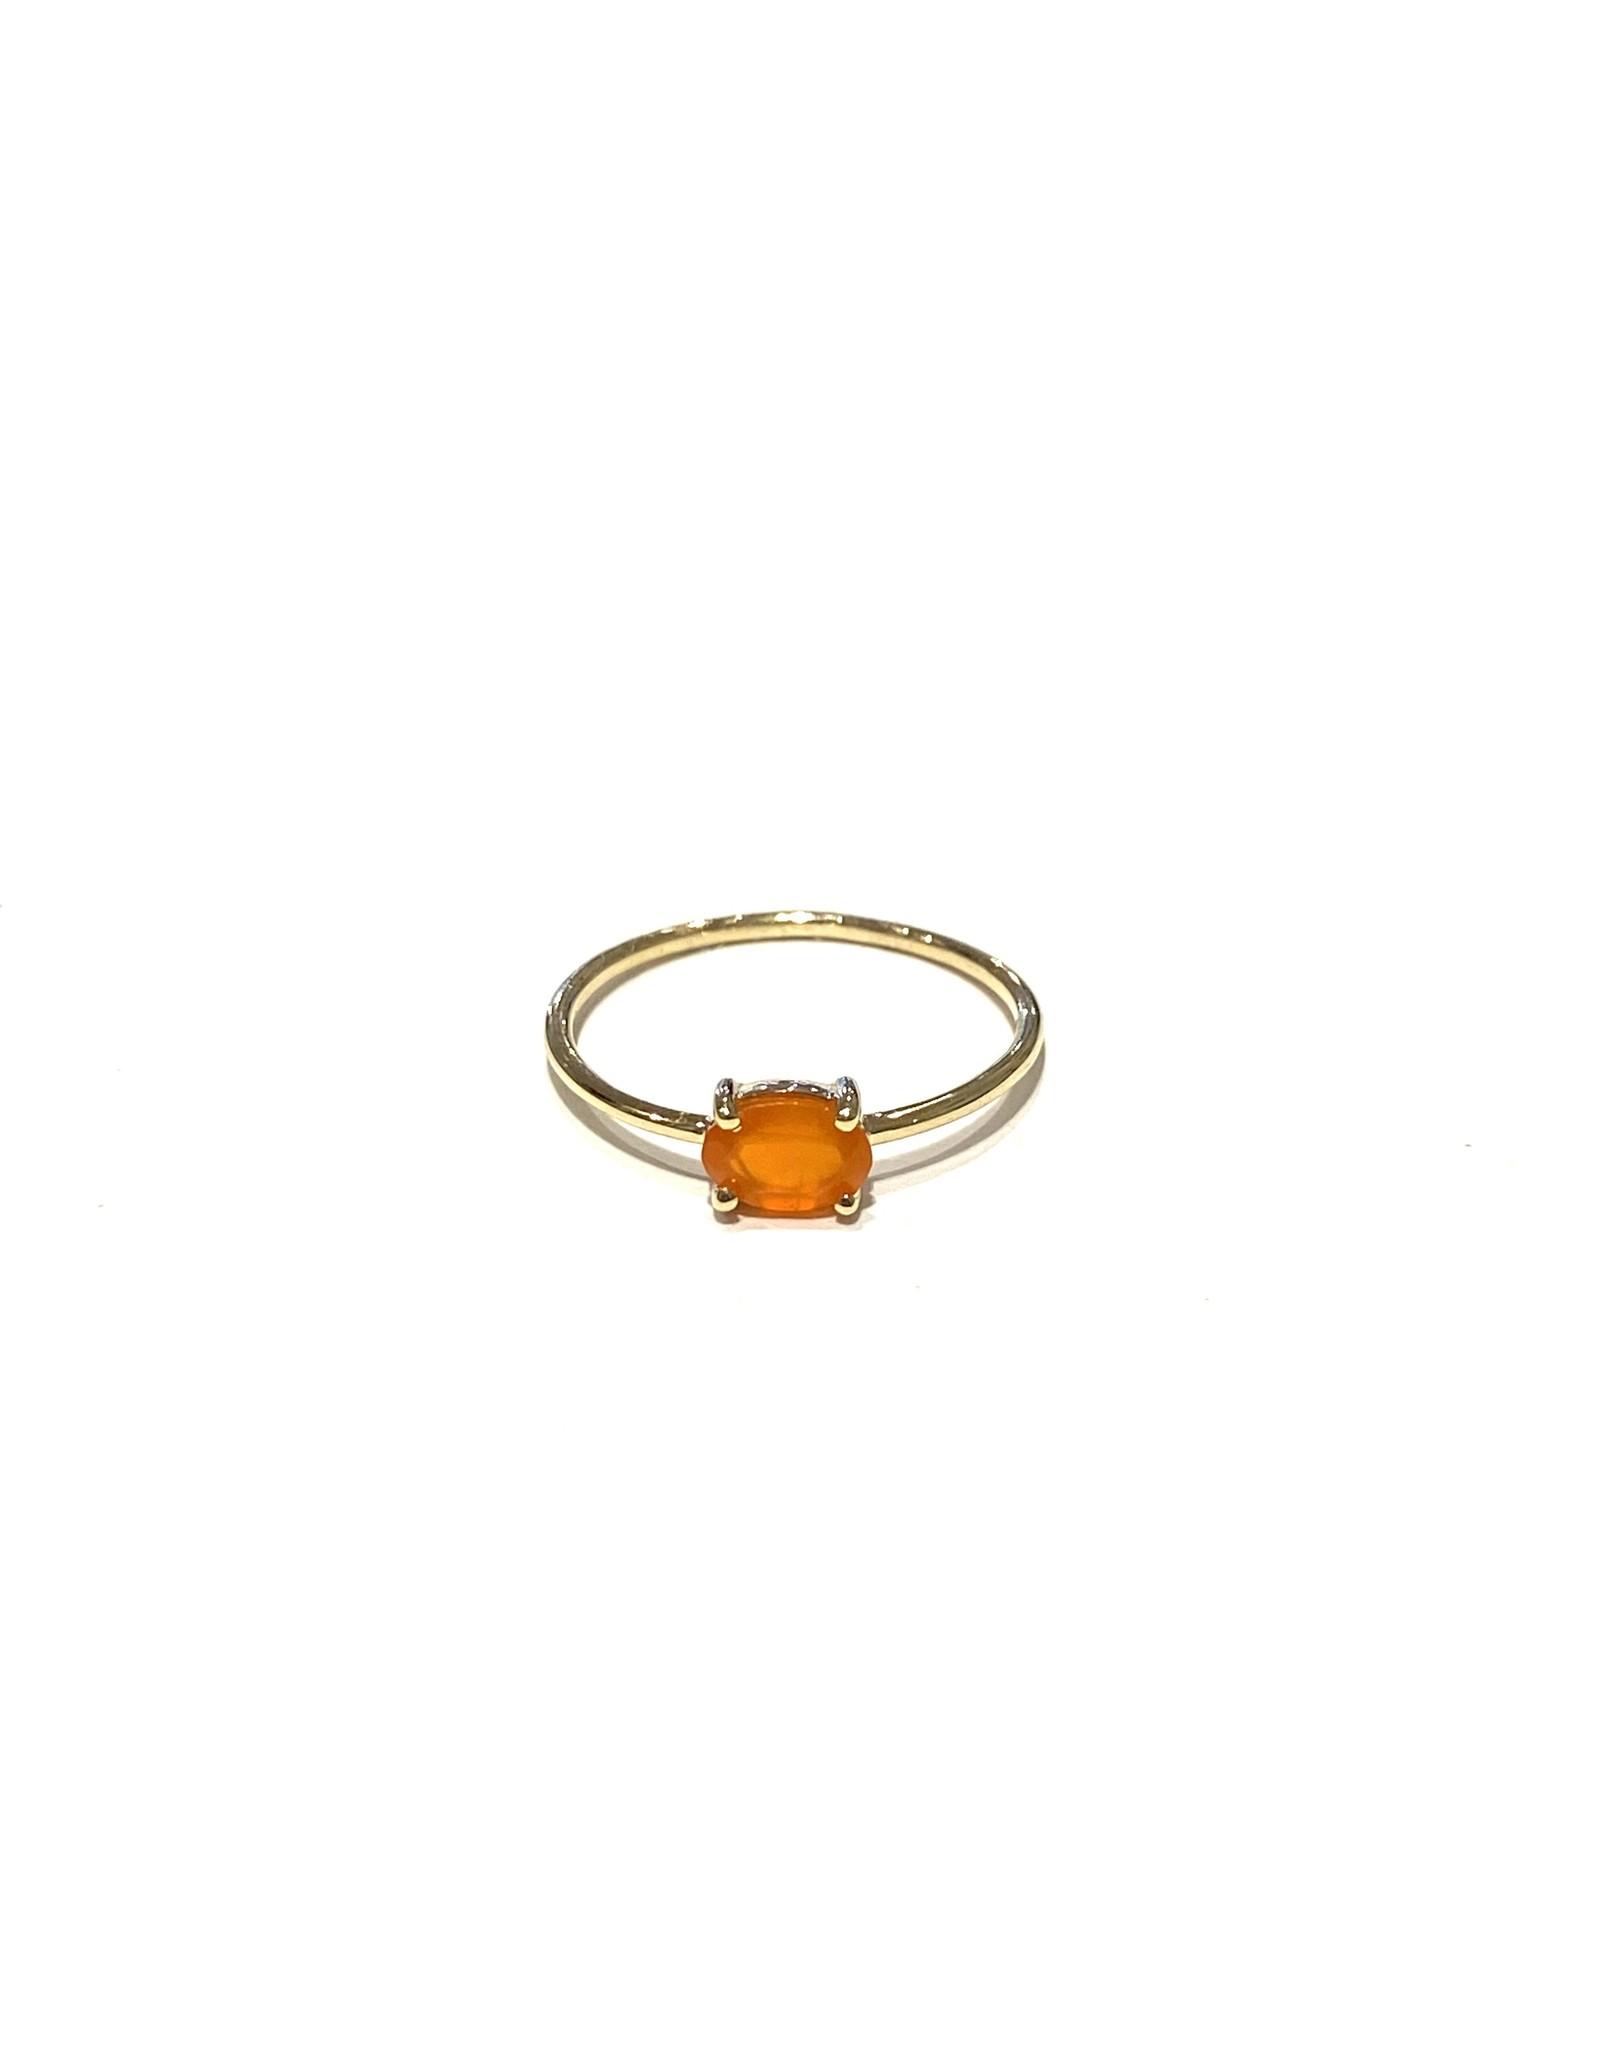 Bo Gold Ring - Gold - Carnelian